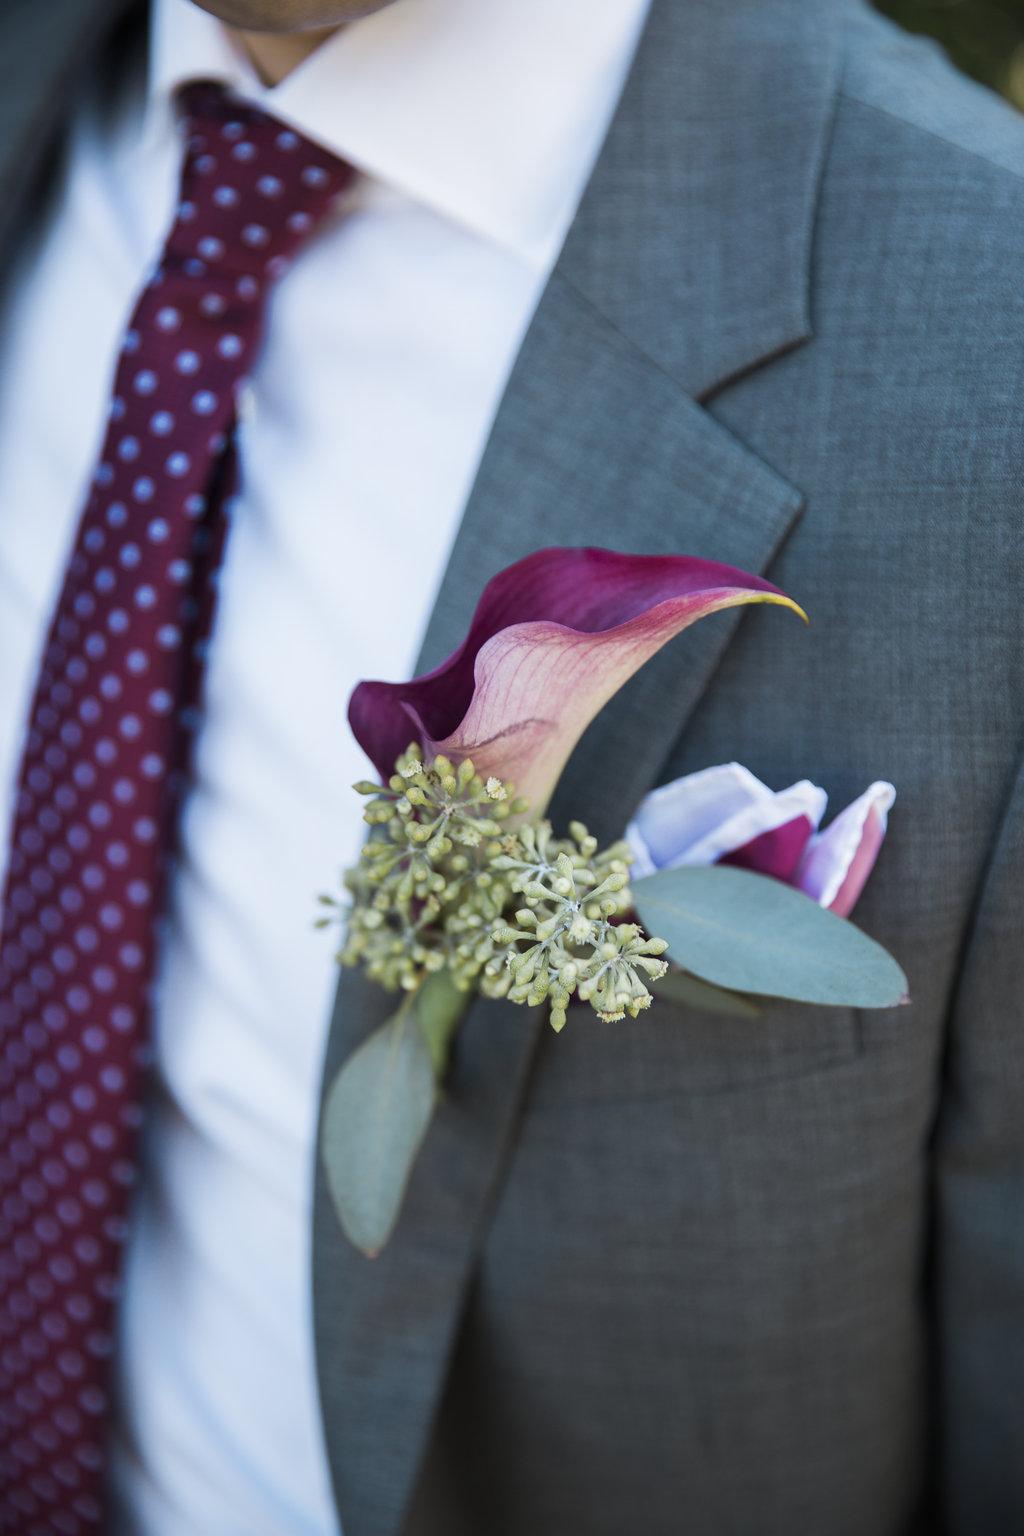 207-carren-courtney-wedding-parker-palm.jpg